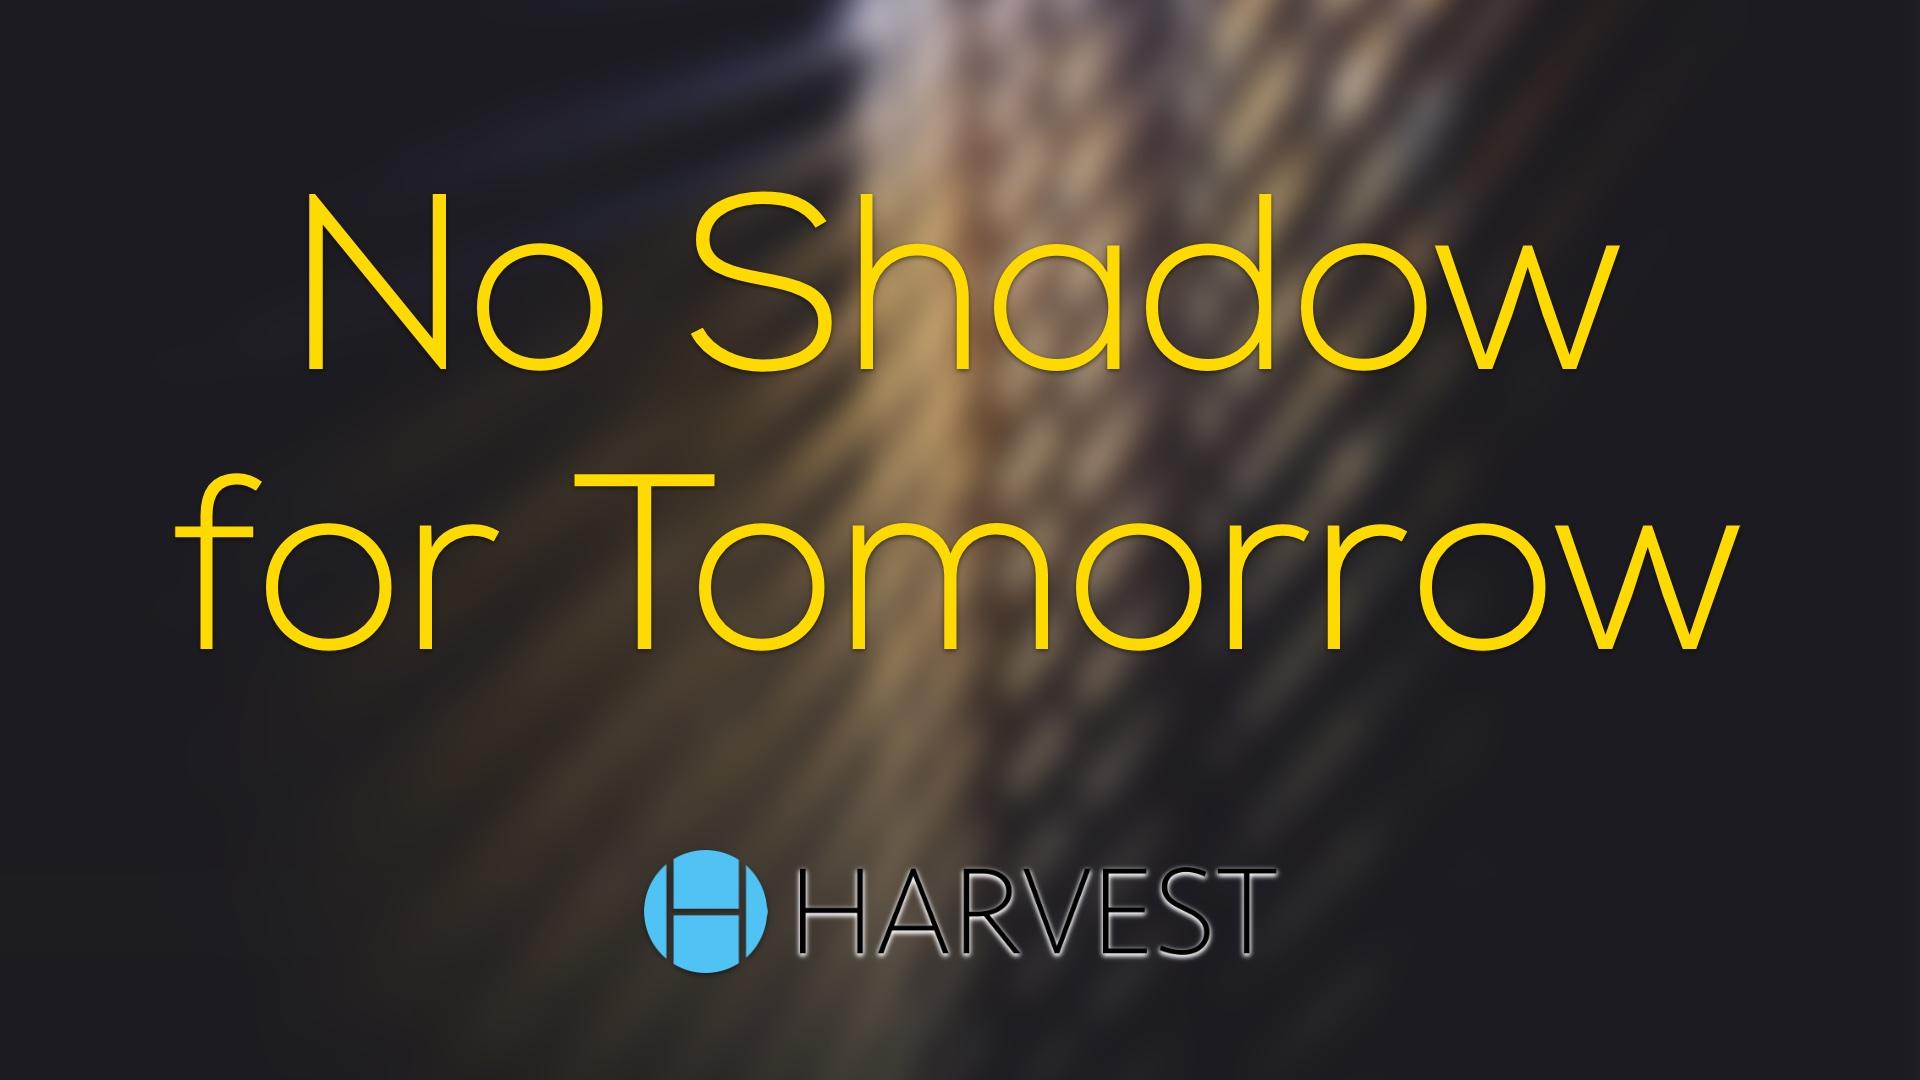 No Shadow for Tomorrow